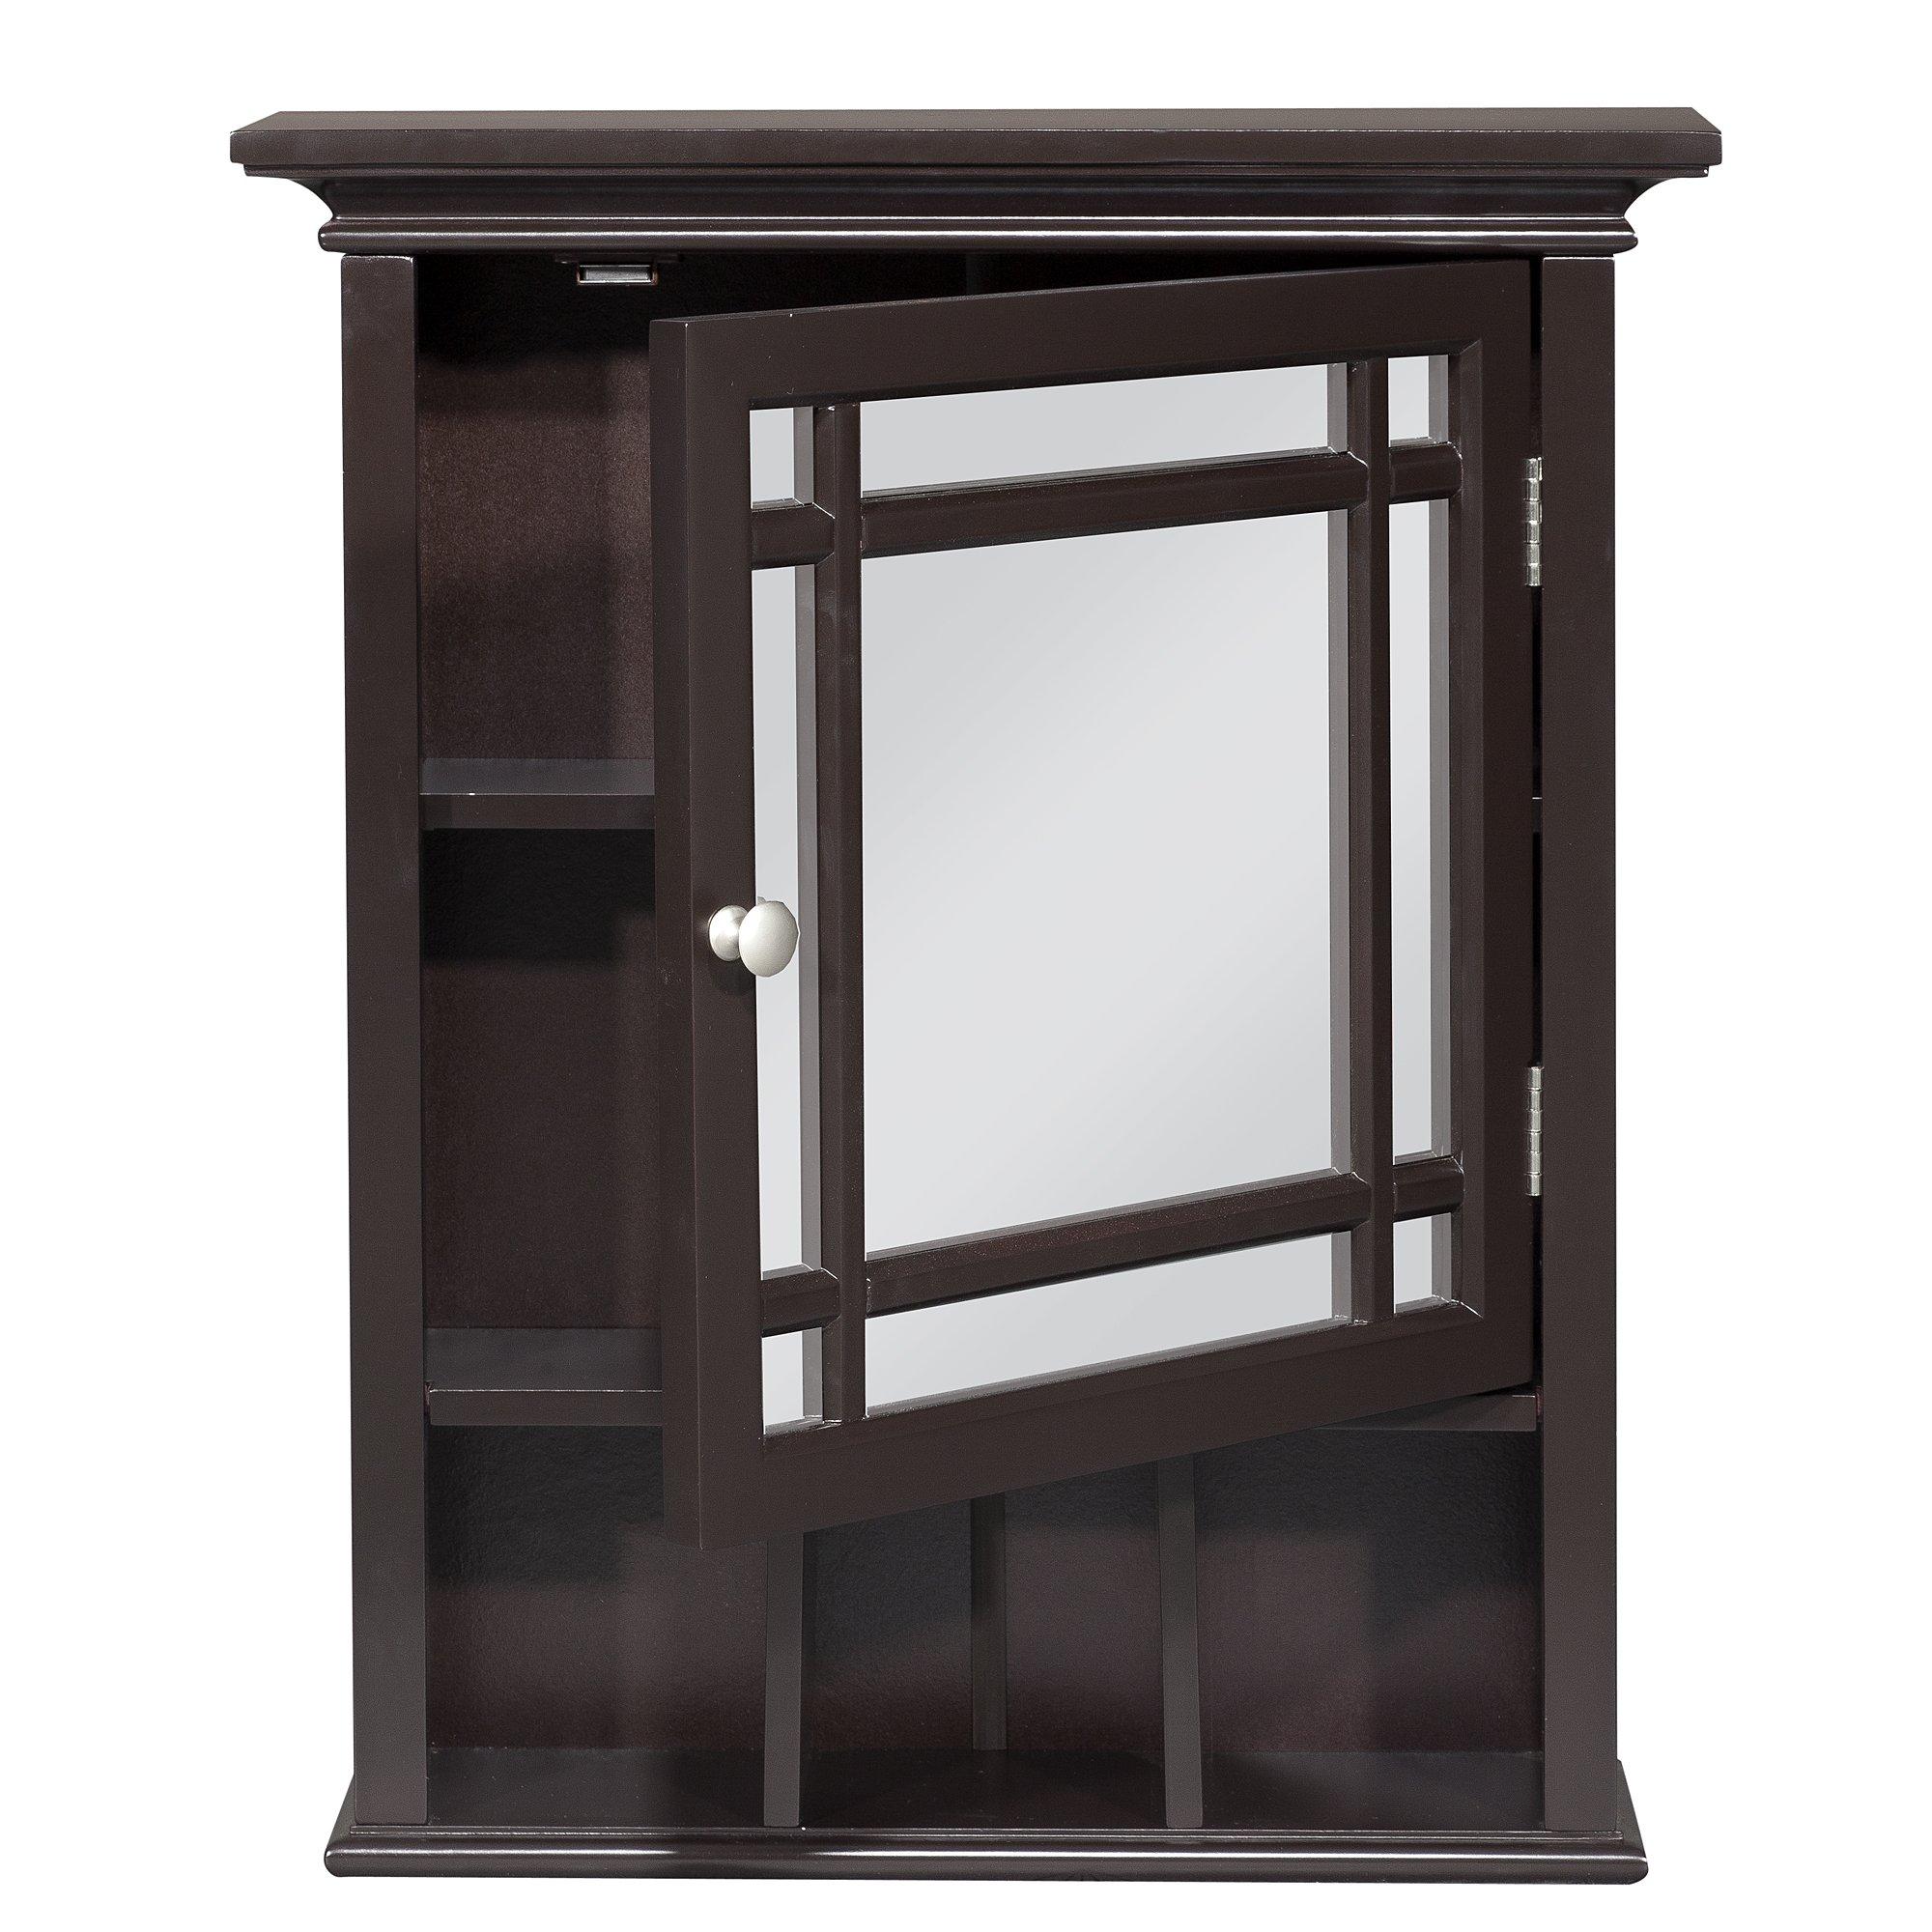 Elegant Home Fashion Neal Medicine Cabinet by Elegant Home Fashion (Image #8)